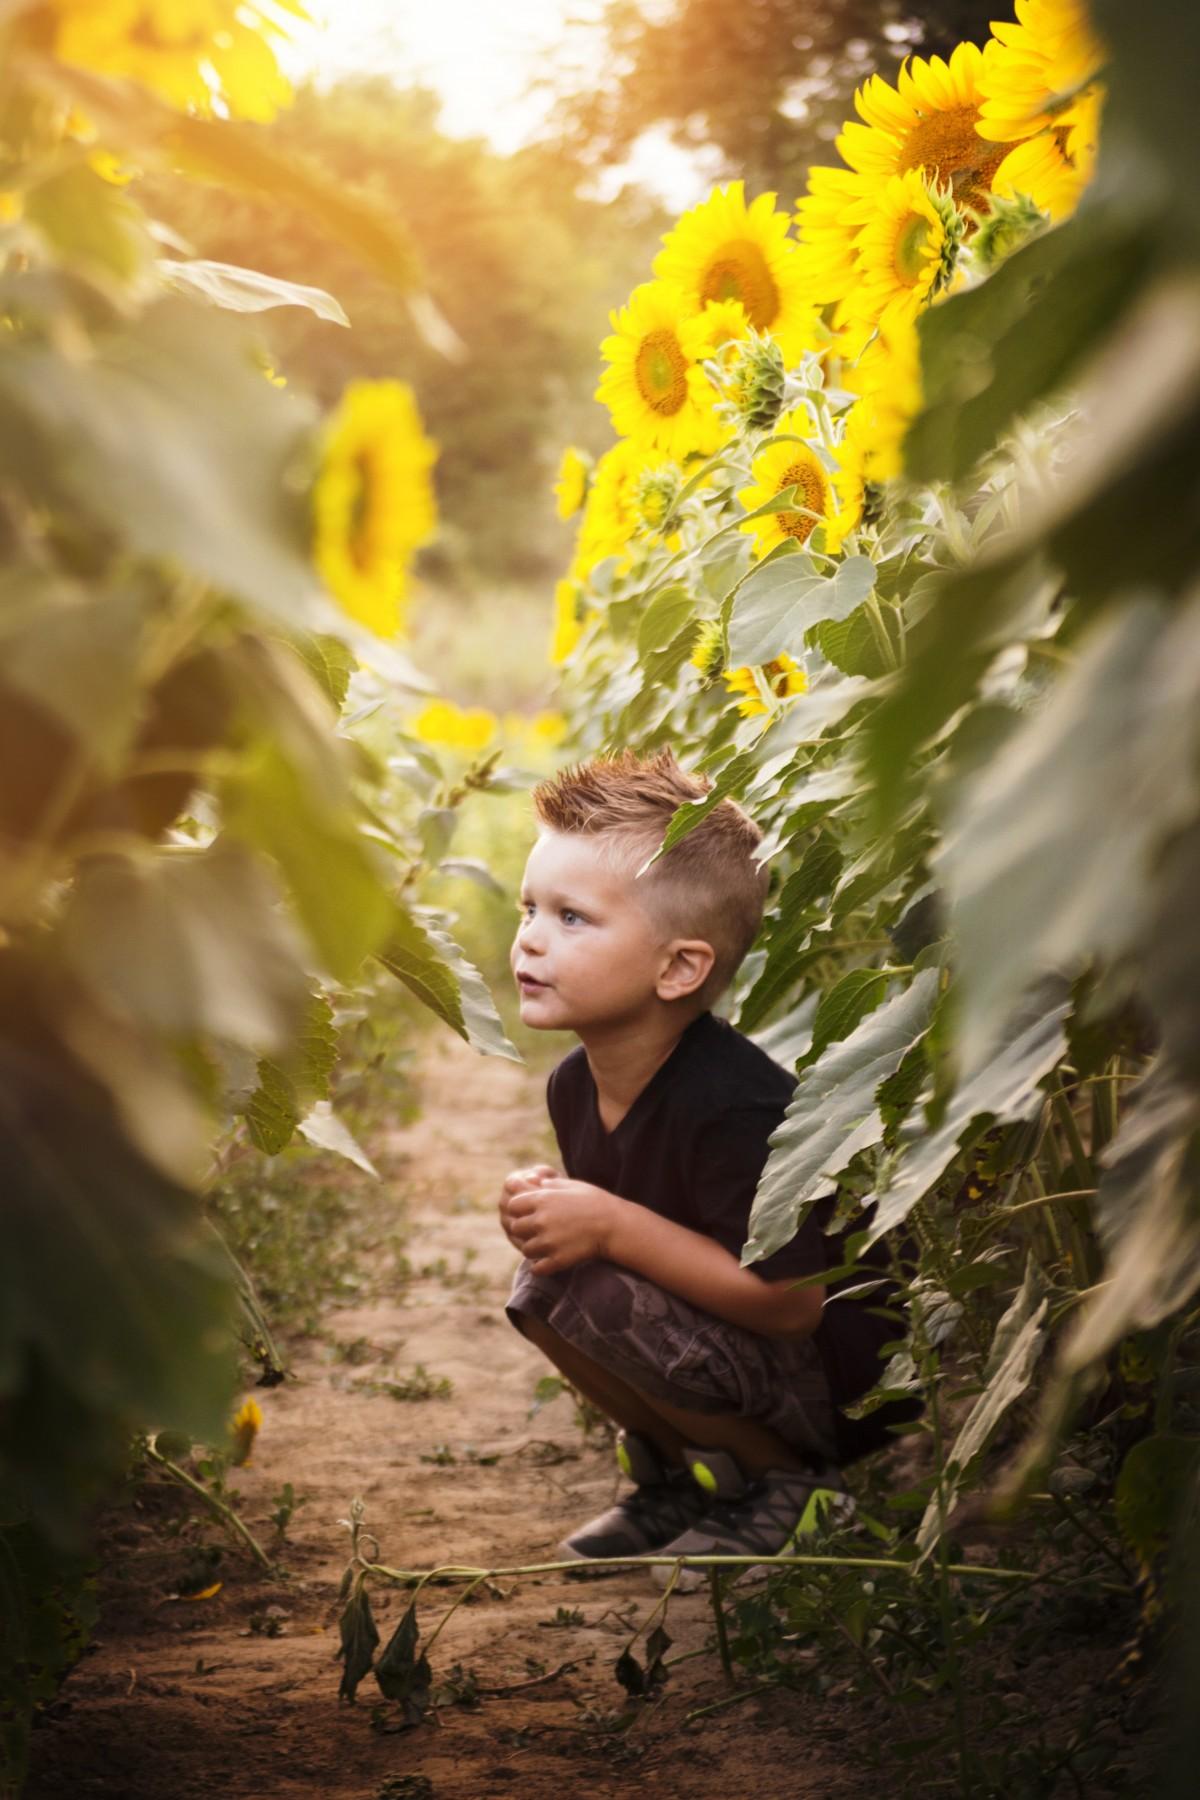 Free Images Sunshine Sun Sunset Field Play Flower